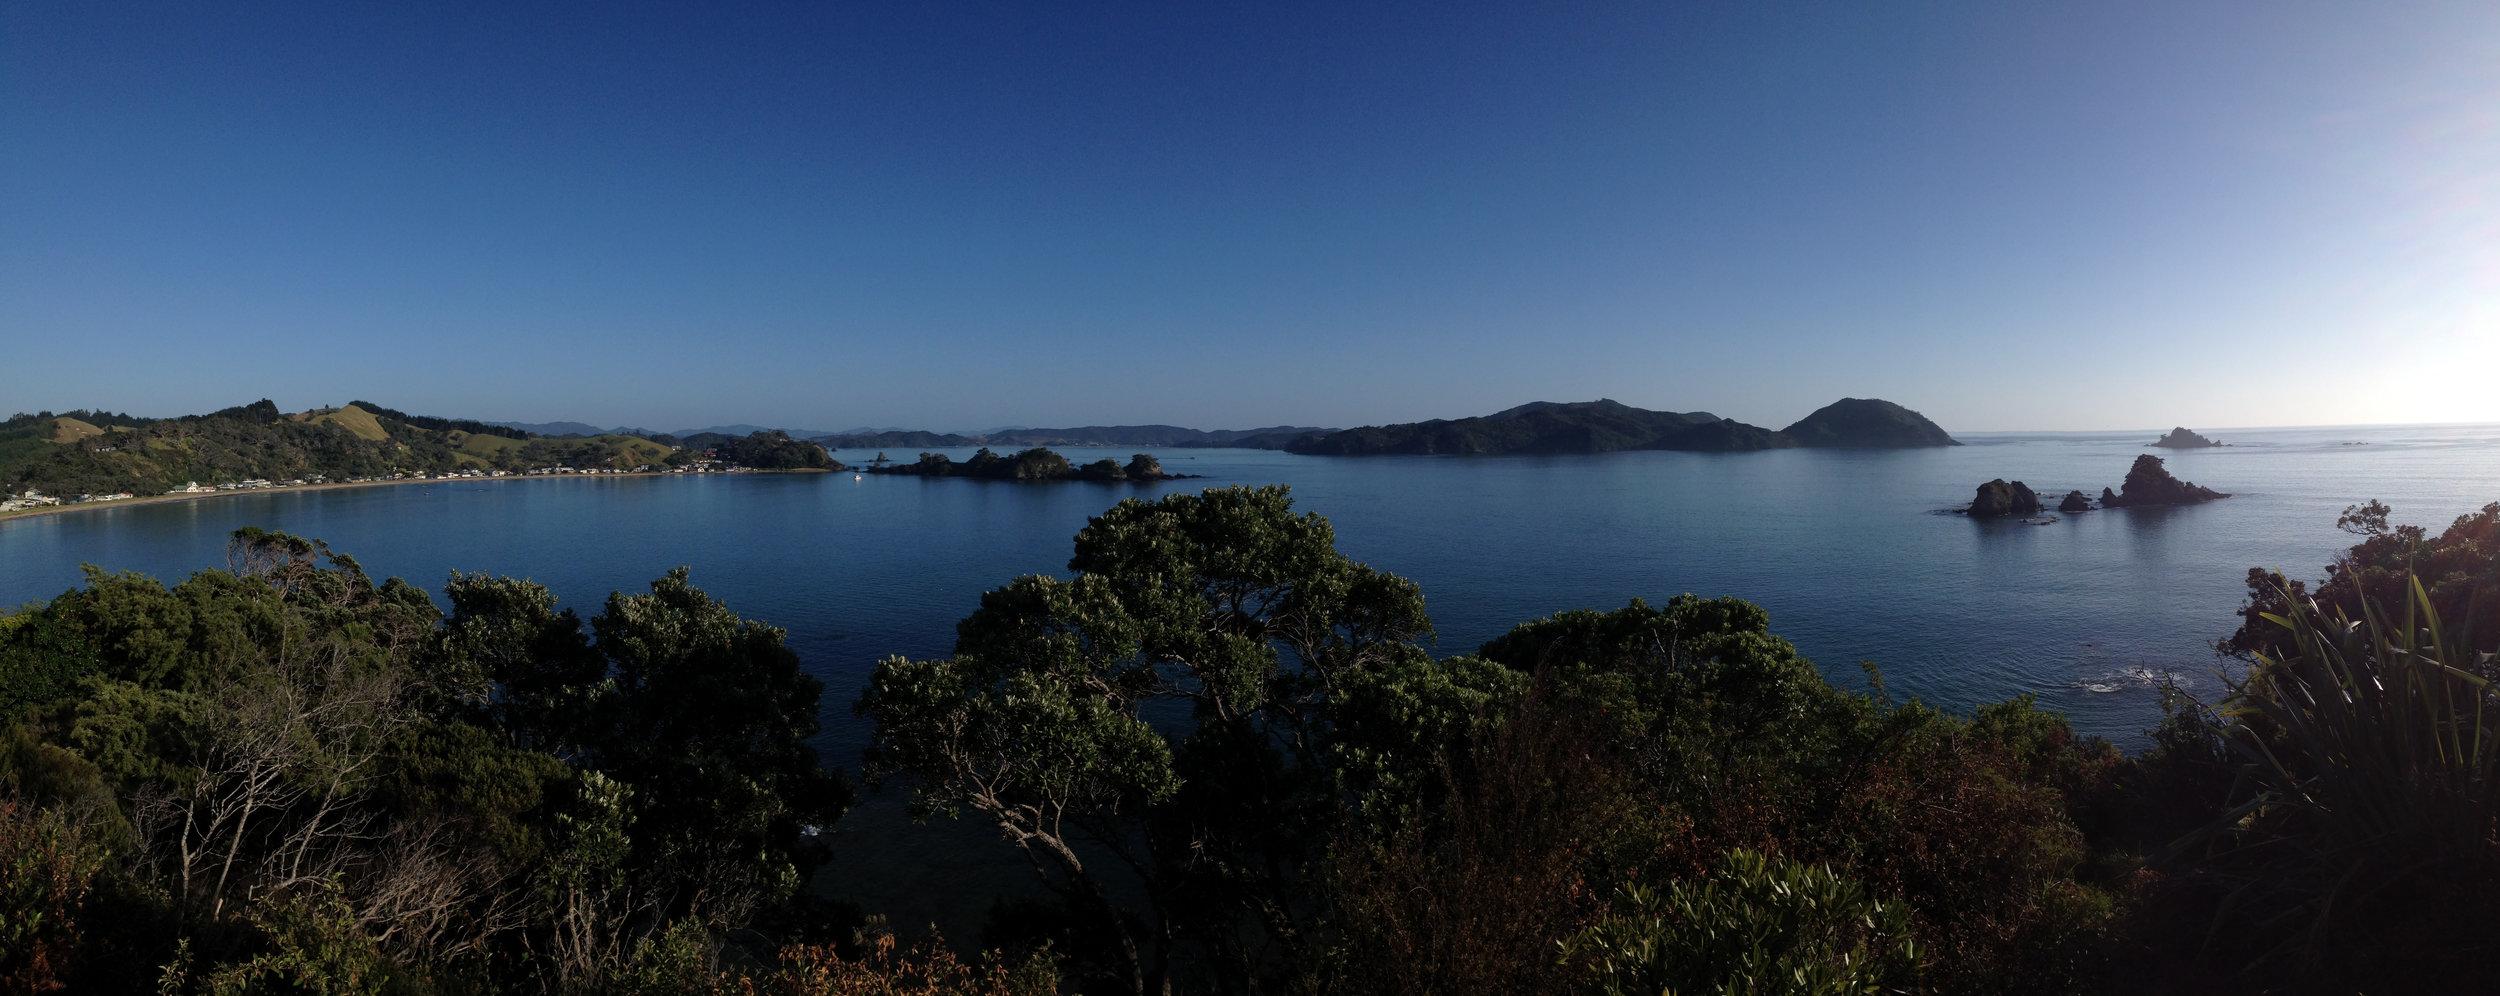 View from southern Oakura Bay towards Whangaruru